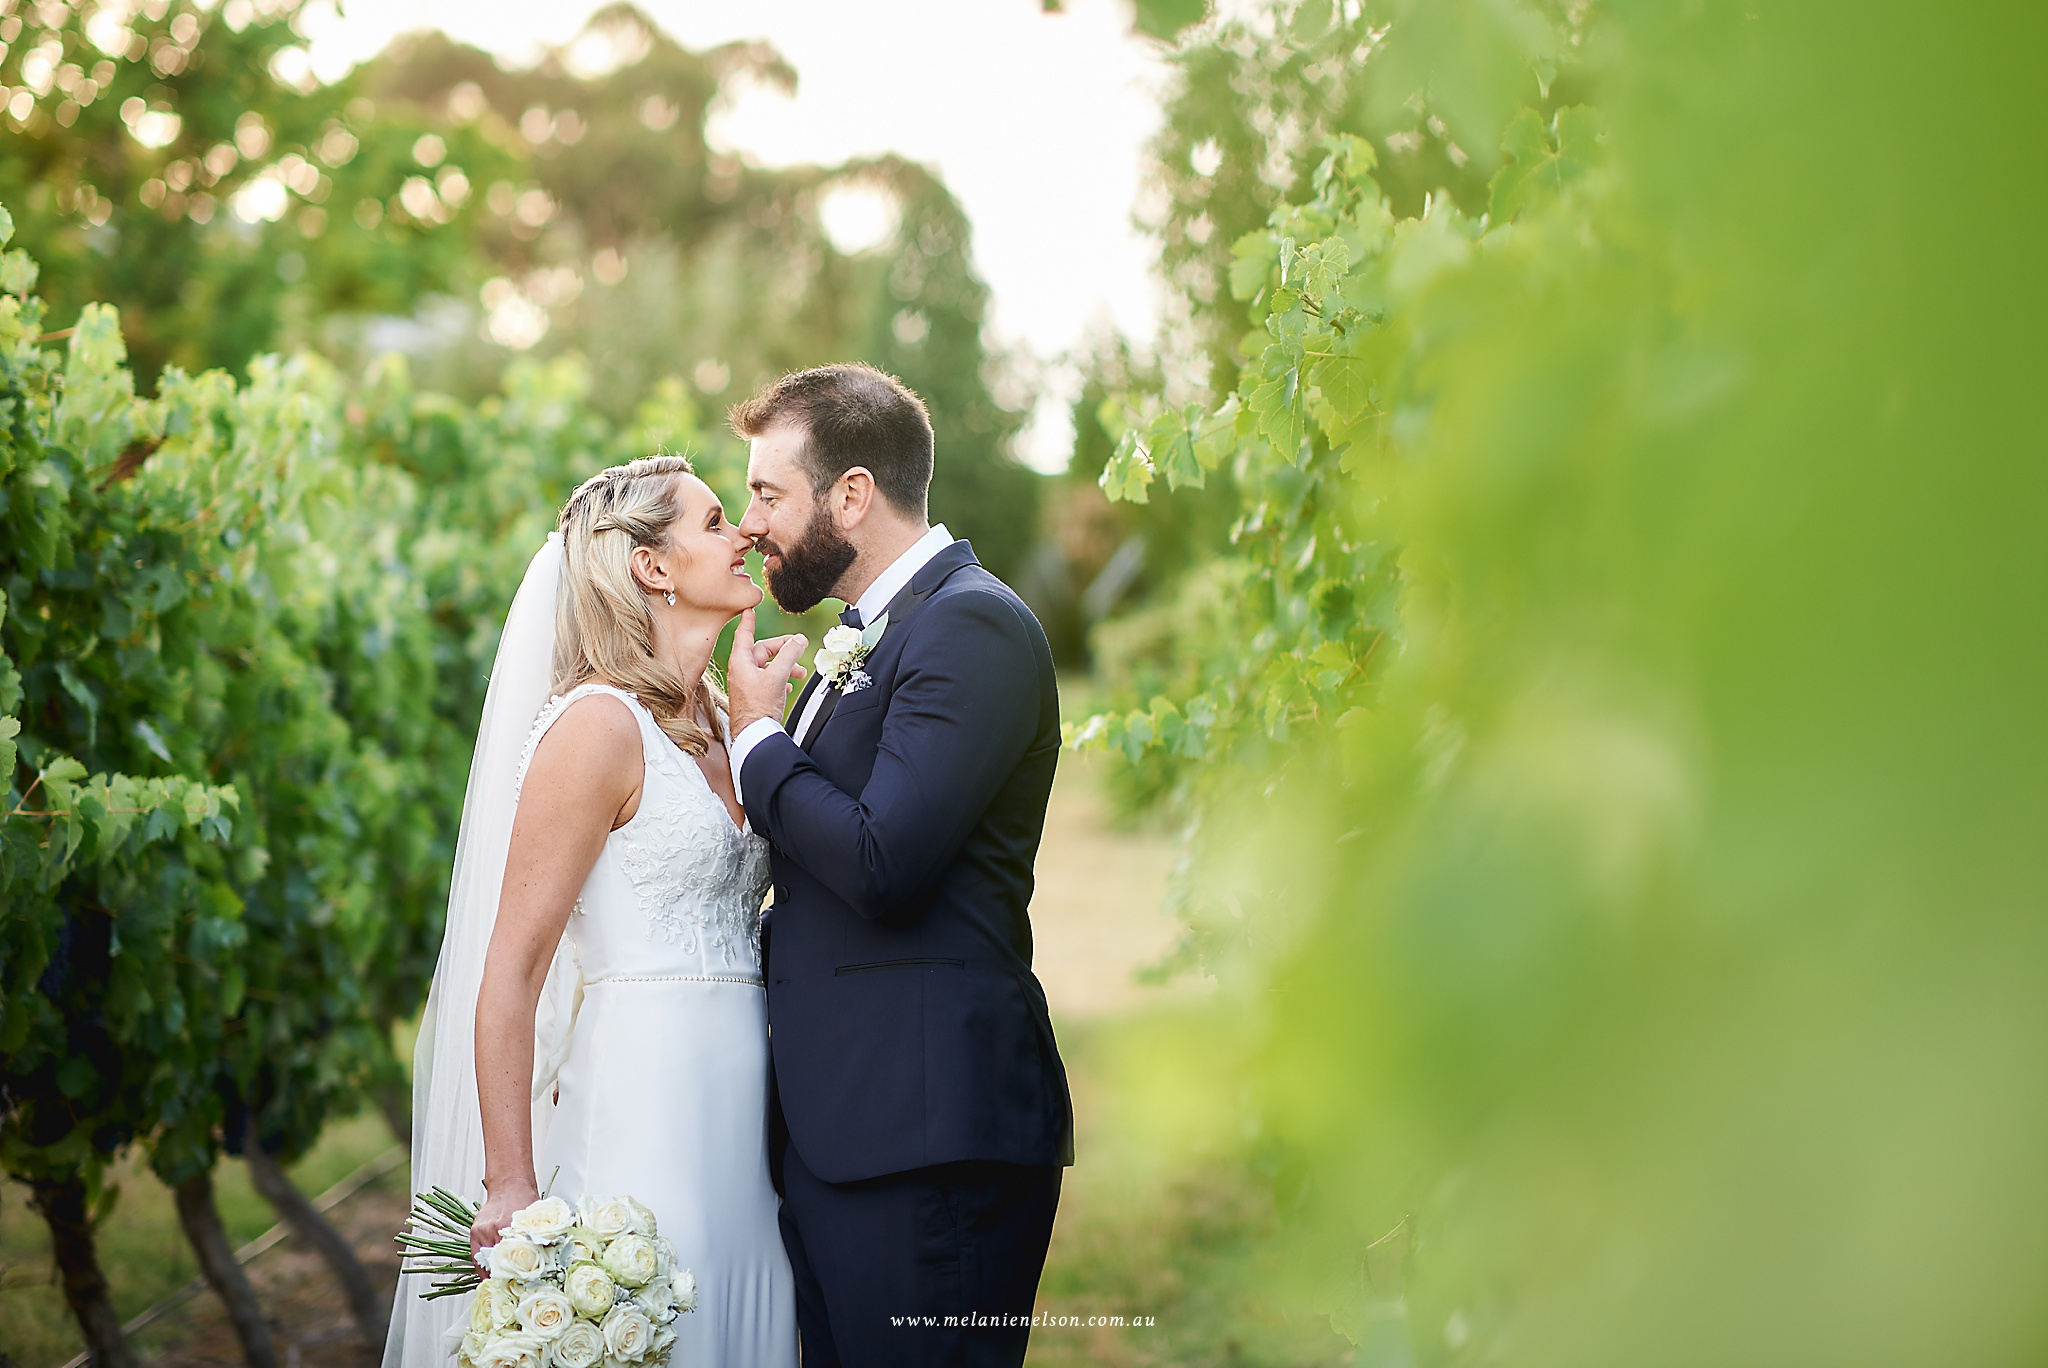 longview_vineyard_wedding_0076.jpg